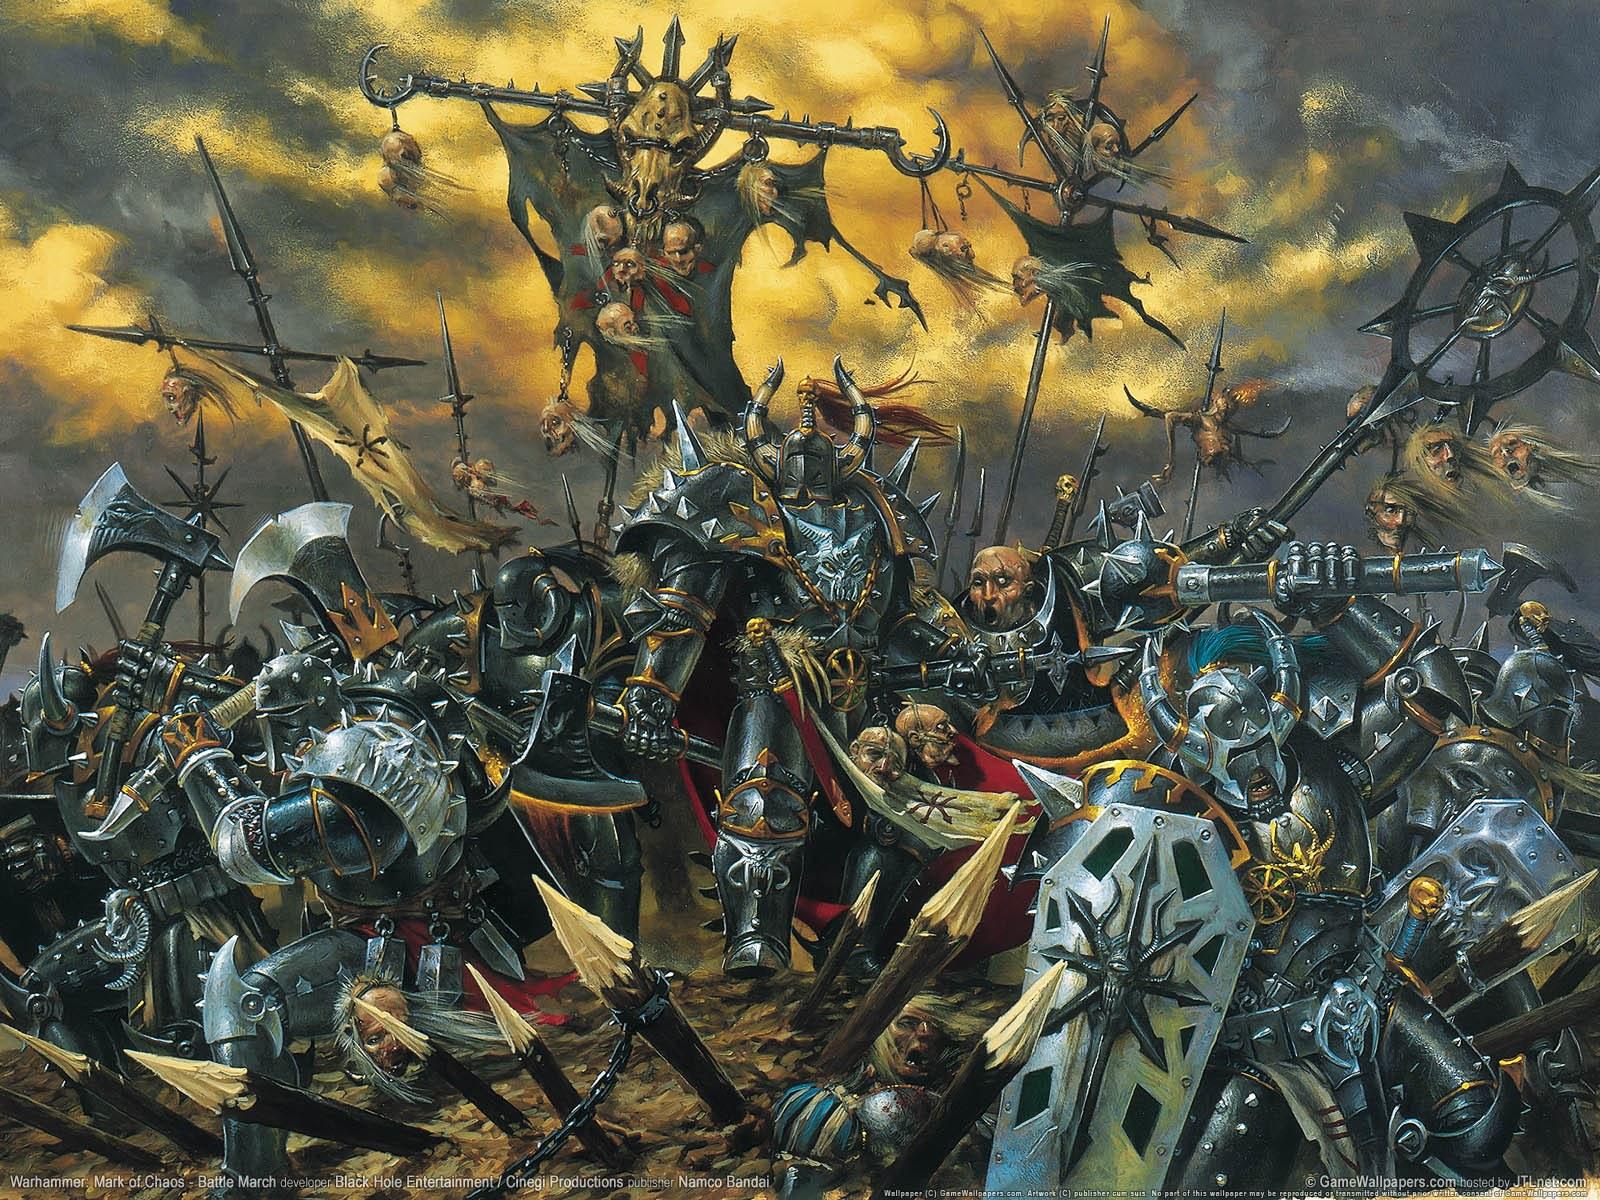 http://3.bp.blogspot.com/-tAtn62ySV3A/T6VOnKXf3RI/AAAAAAAAAUA/clxfcB__huU/s1600/warhammer-mark-of-chaos-battle-1521.jpg